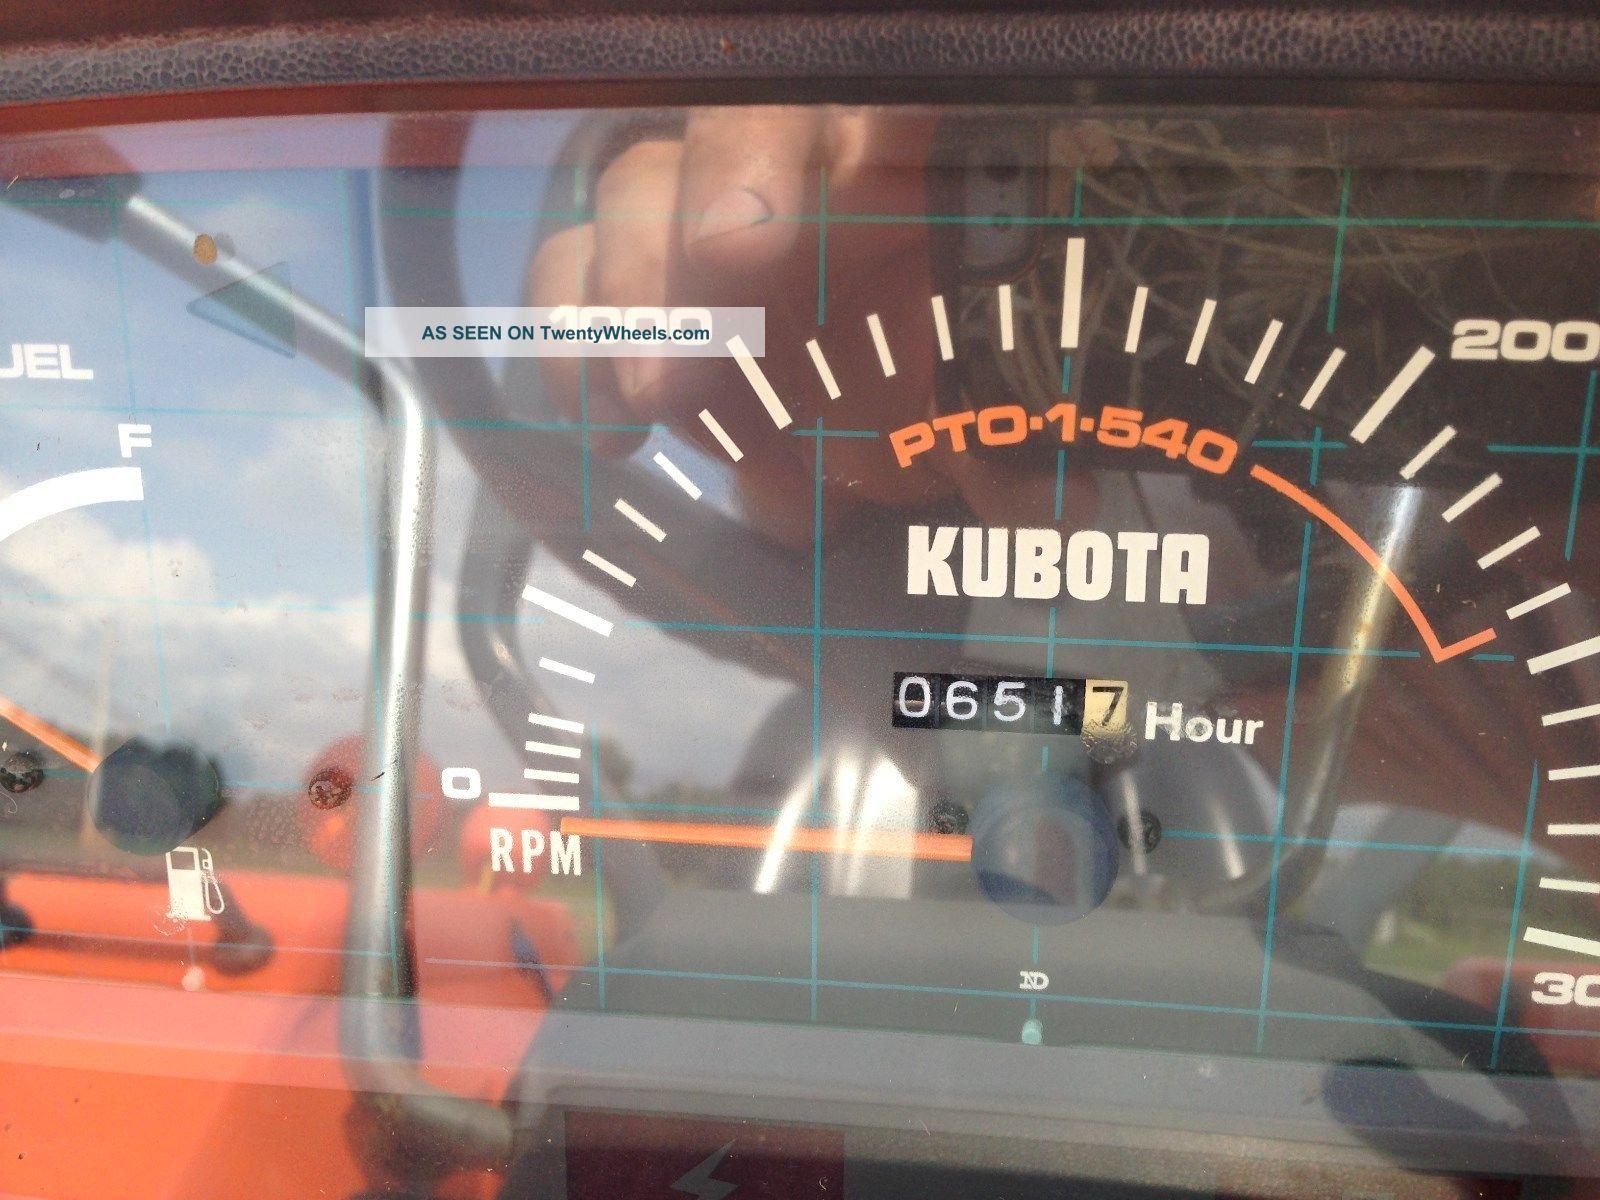 kubota l2250 diesel tractor with bush hog kubota l2850 parts kubota l2850 parts kubota l2850 parts kubota l2850 parts